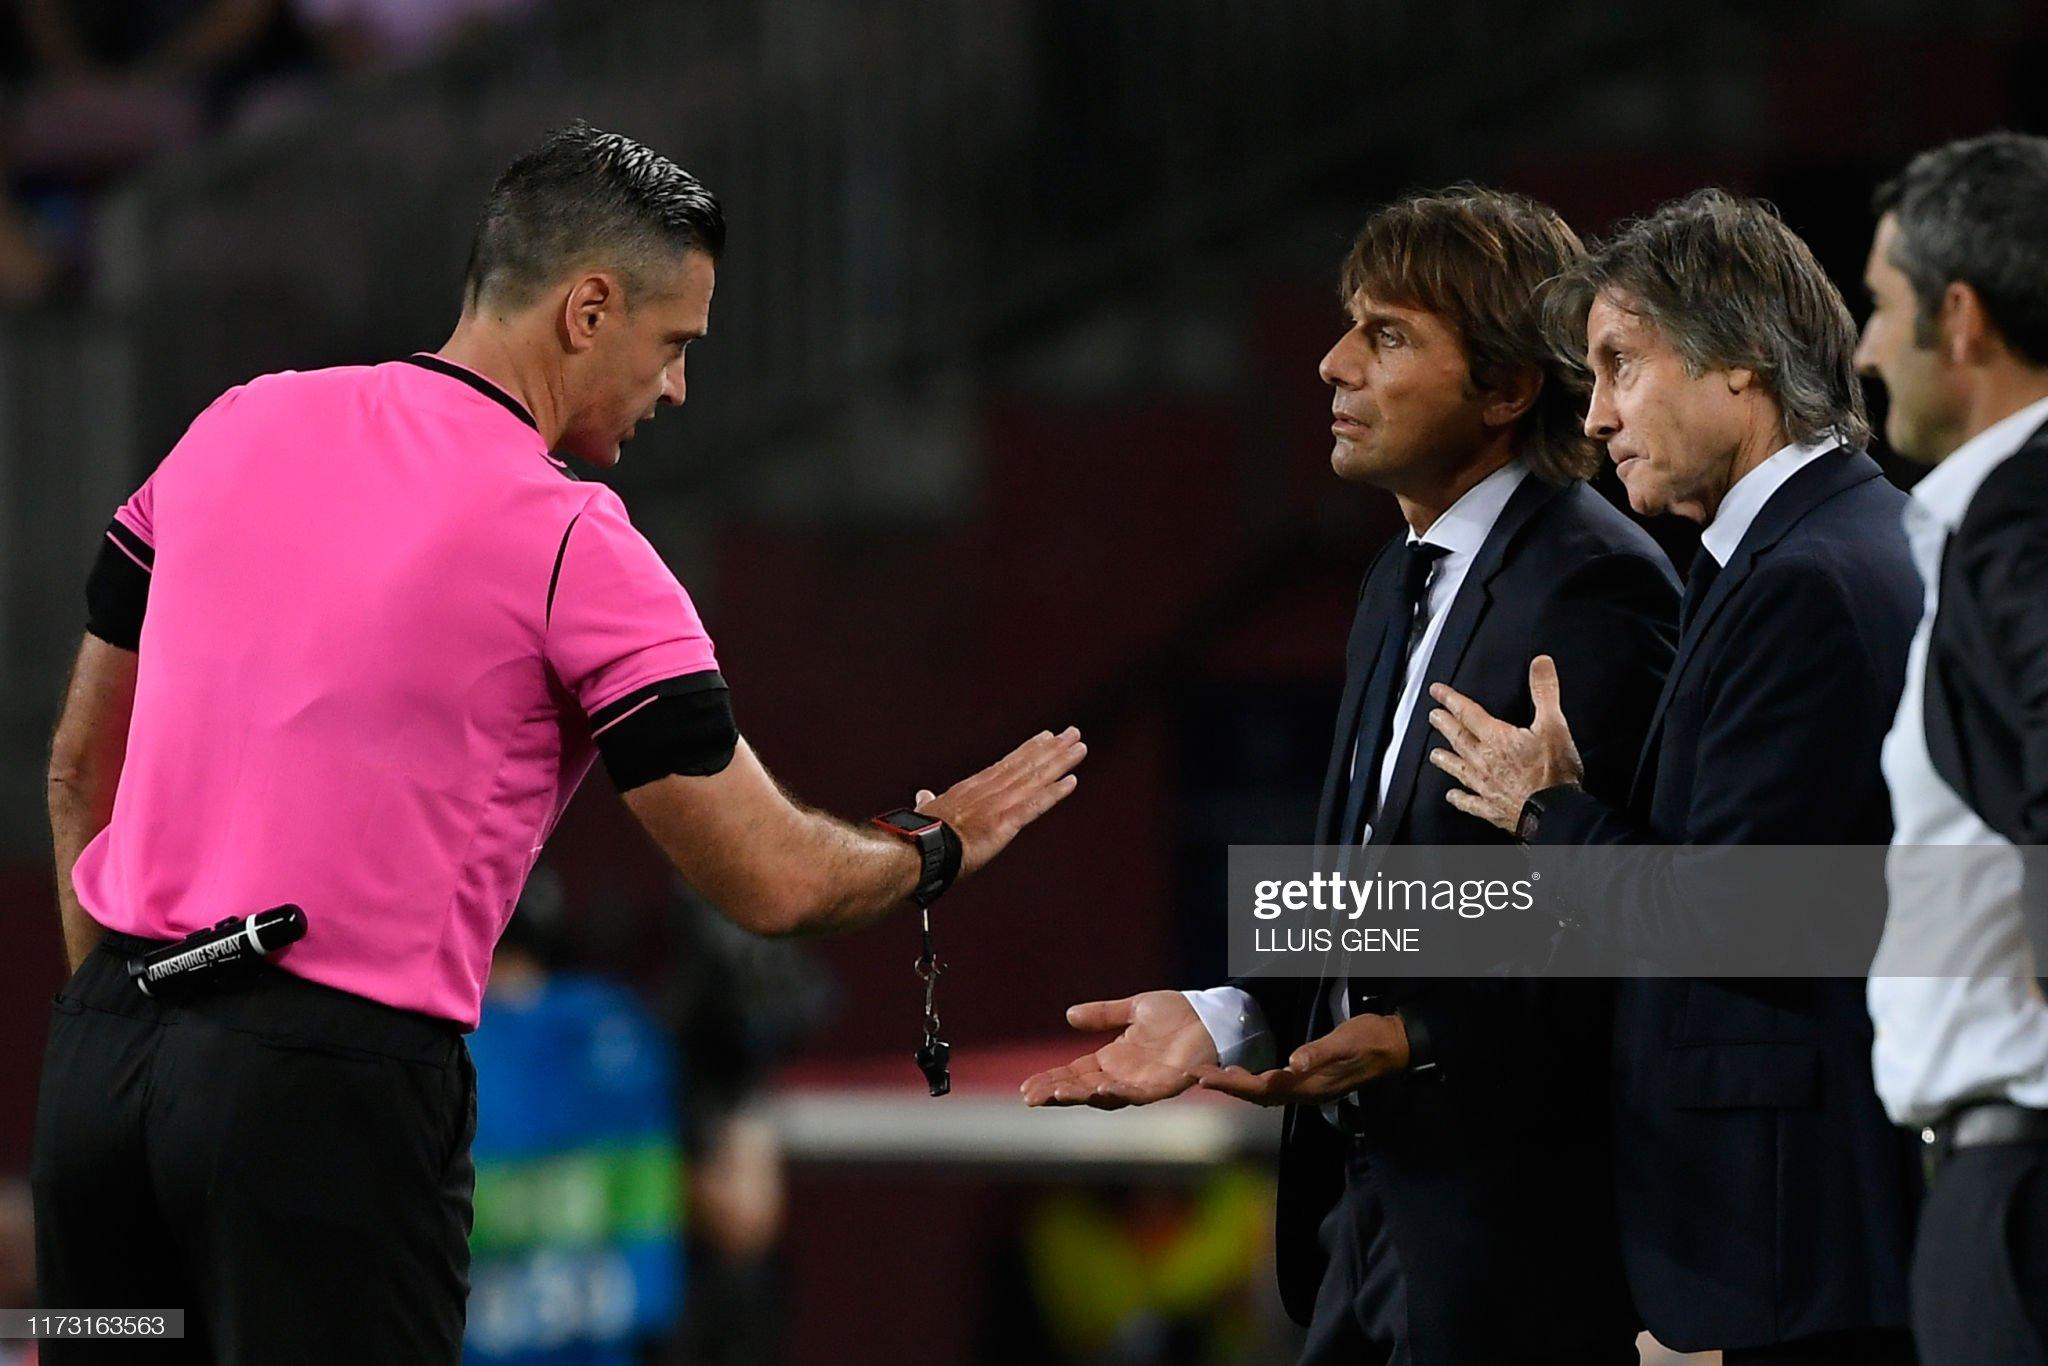 صور مباراة : برشلونة - إنتر 2-1 ( 02-10-2019 )  The-referee-damir-skomina-speaks-to-inter-milans-italian-coach-conte-picture-id1173163563?s=2048x2048